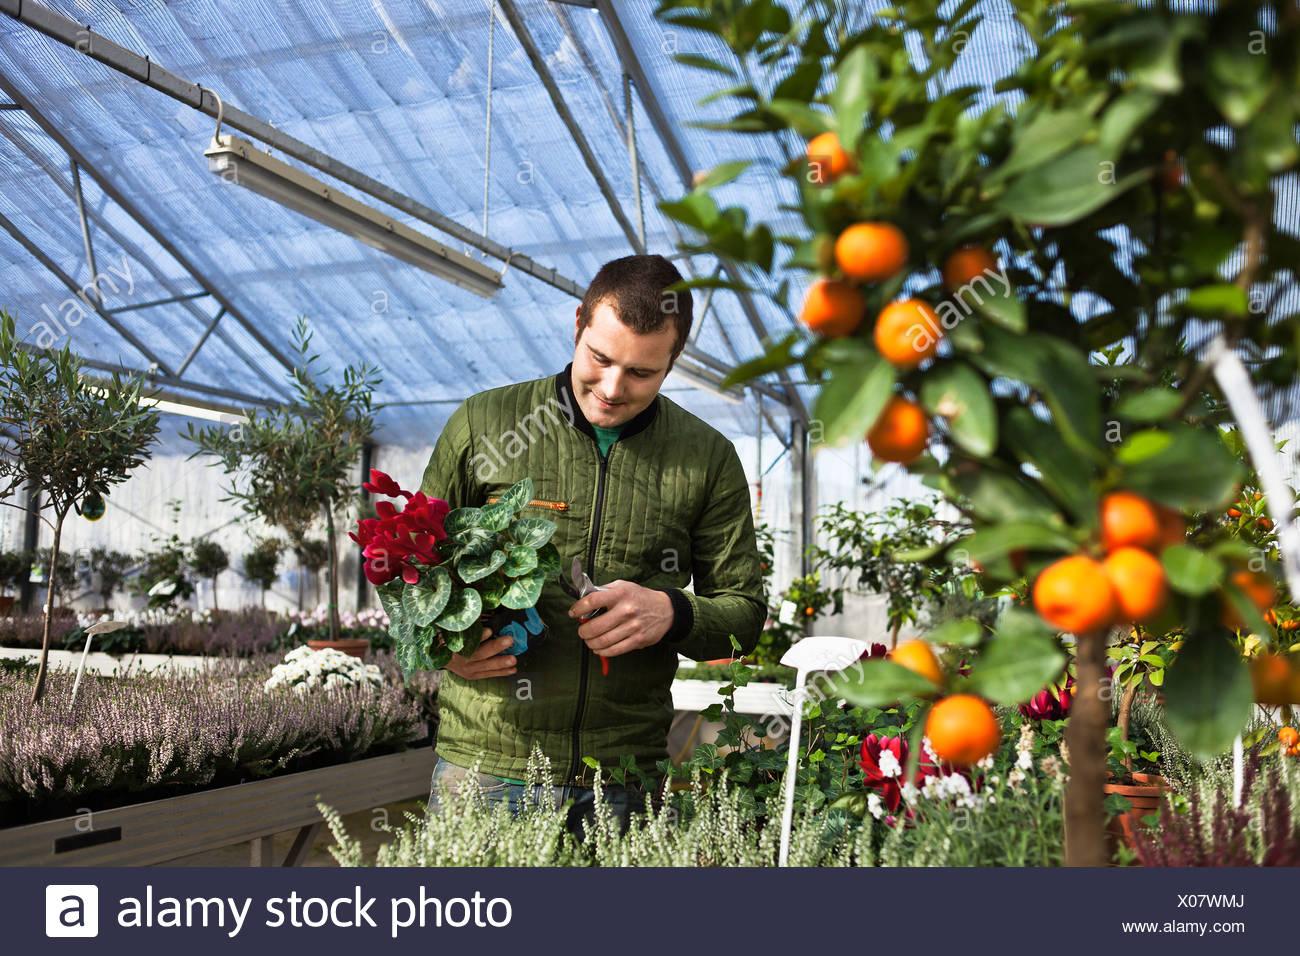 Gardener working in greenhouse Stock Photo